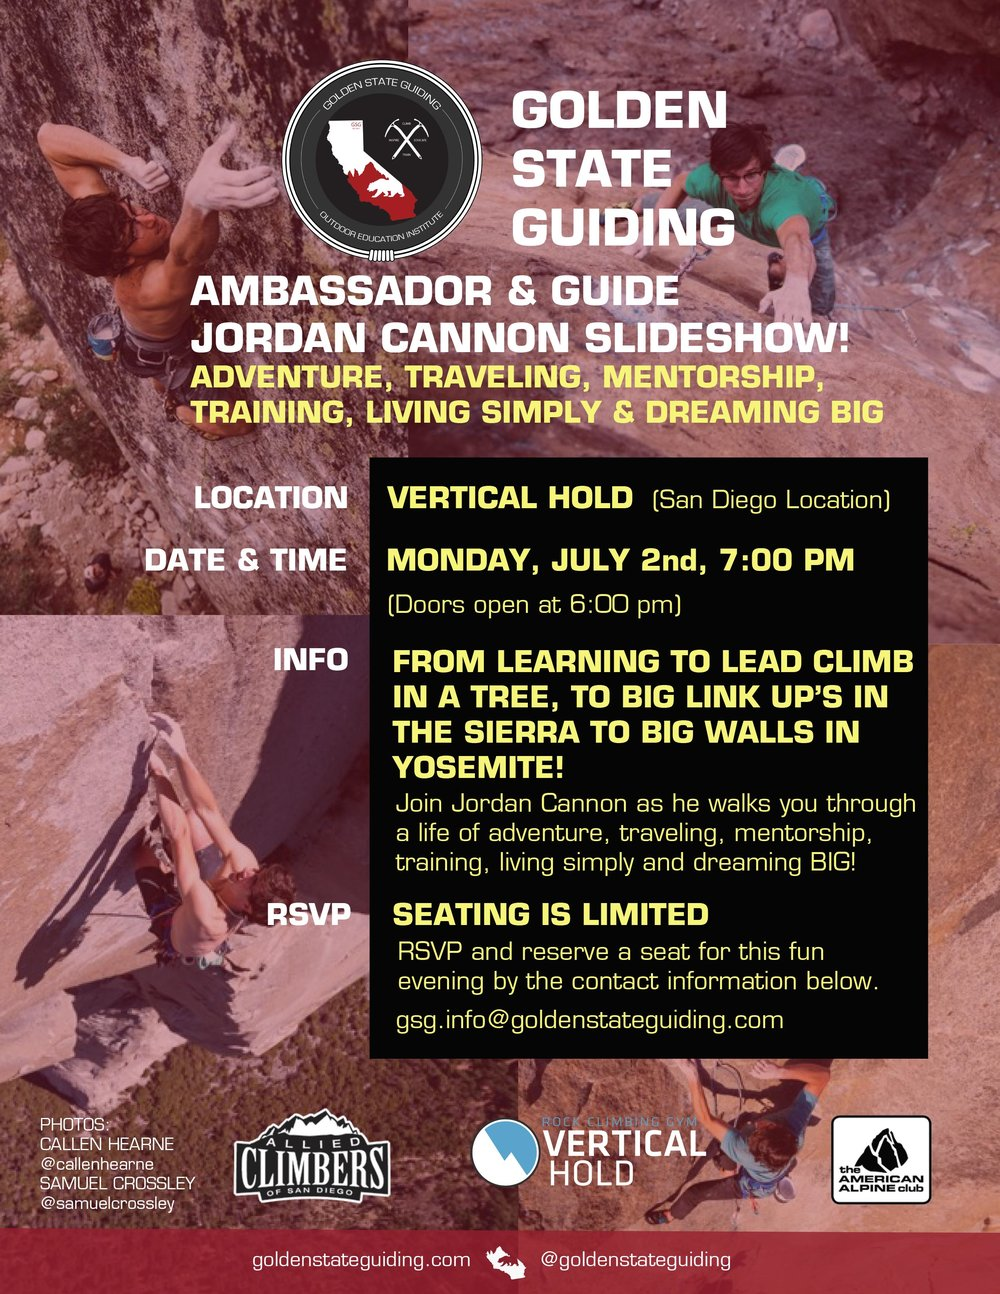 Golden State Guiding Ambassador & Guide Jordan Cannon Slideshow